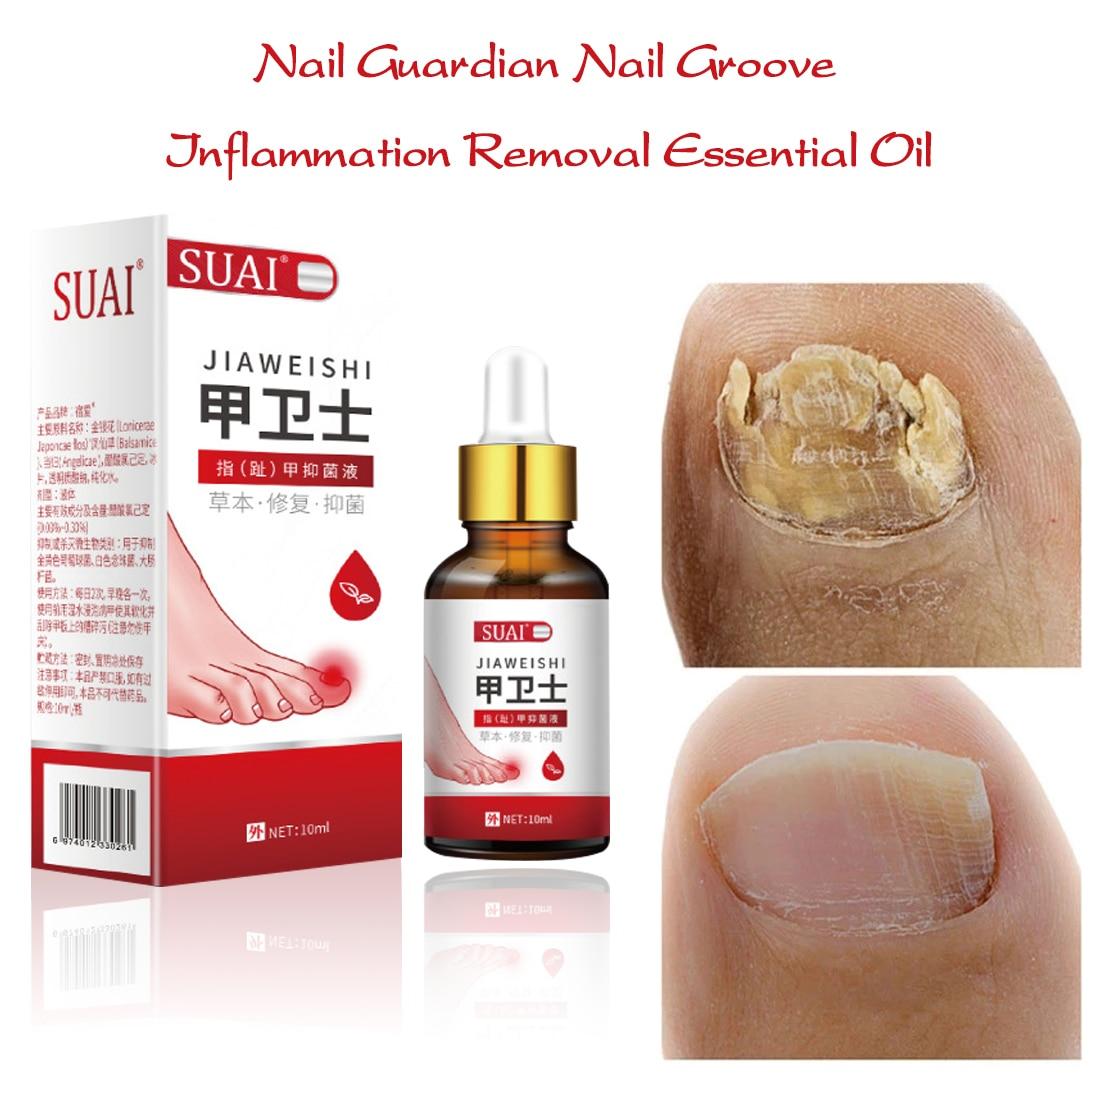 1pcs Nail Fungal Treatment Feet Care Essence Foot Whitening Toe Nail Fungus Removal Gel Anti Infection Paronychia Onychomycosis